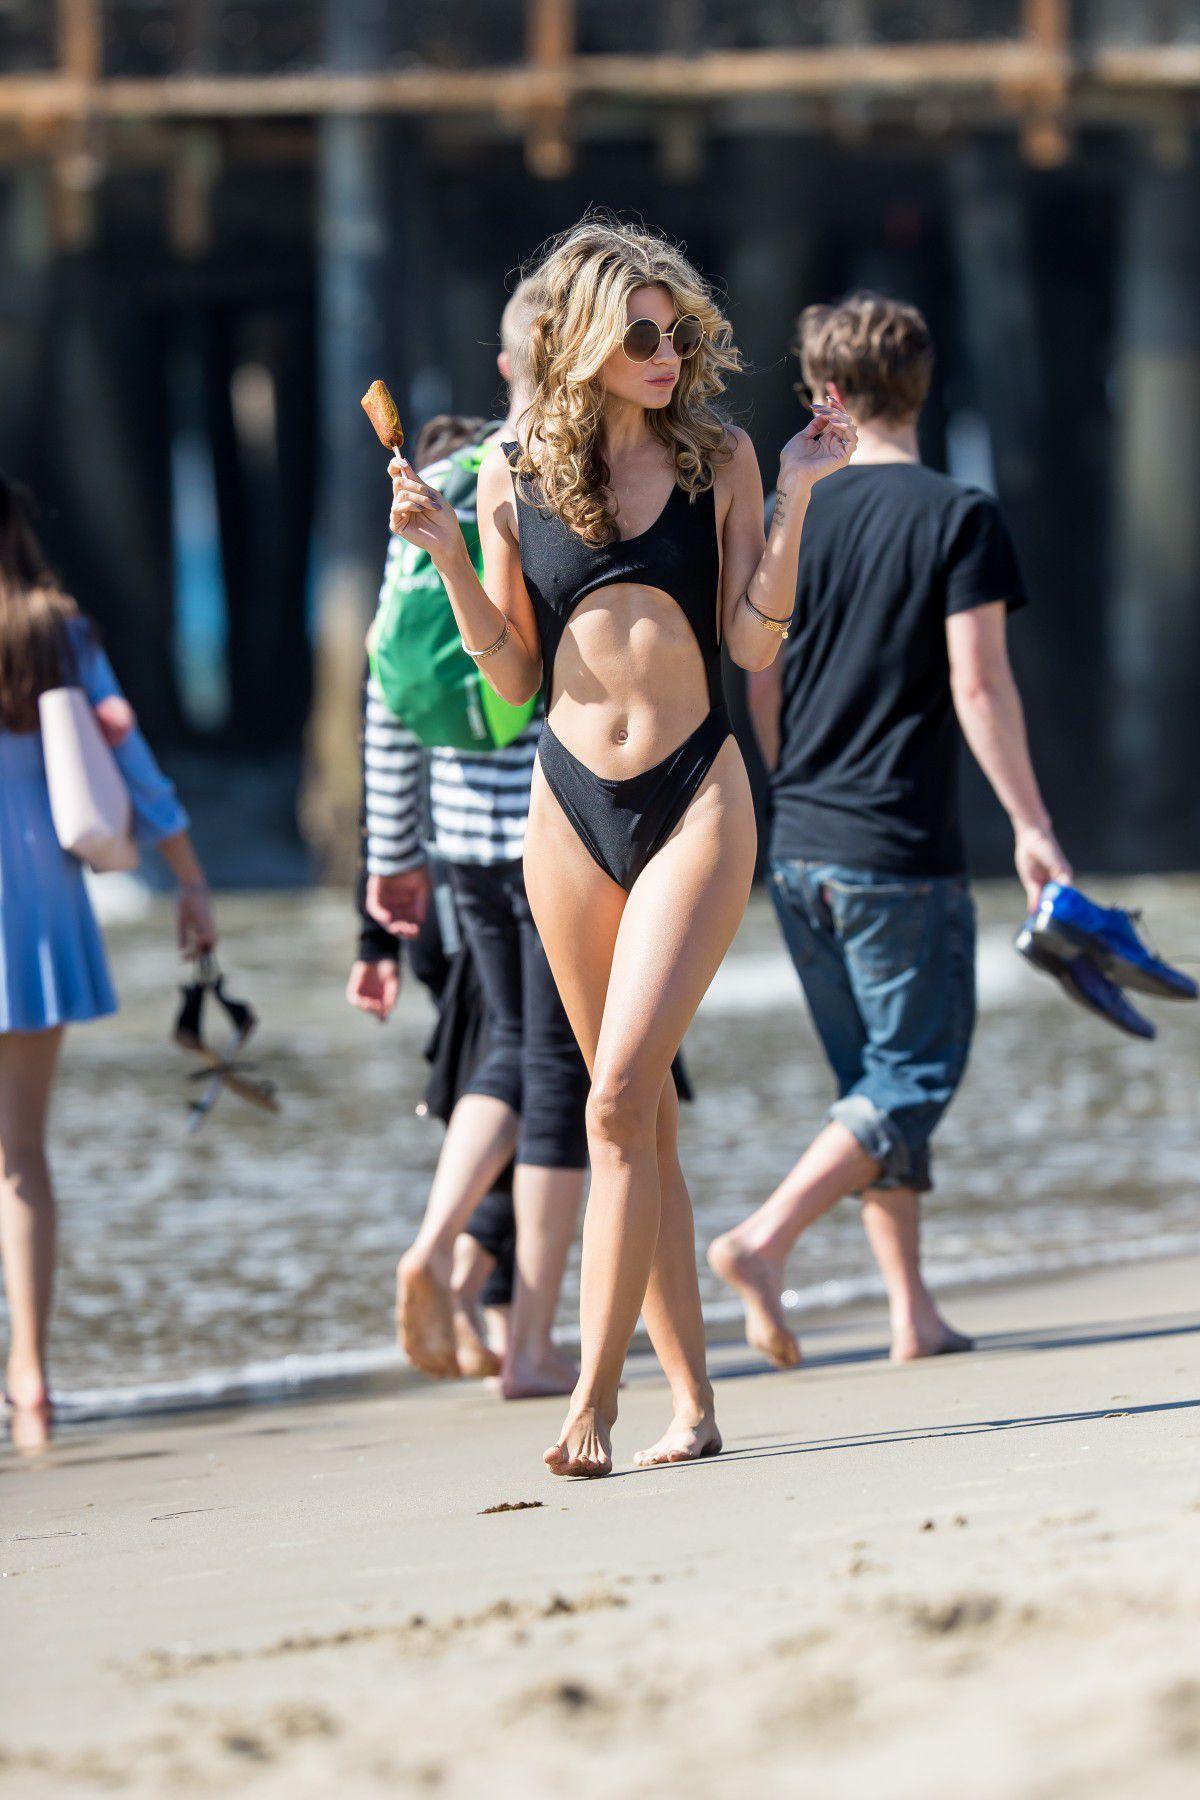 rachel-mccord-cameltoe-in-black-swimsuit-on-the-beach-in-santa-monica-3719